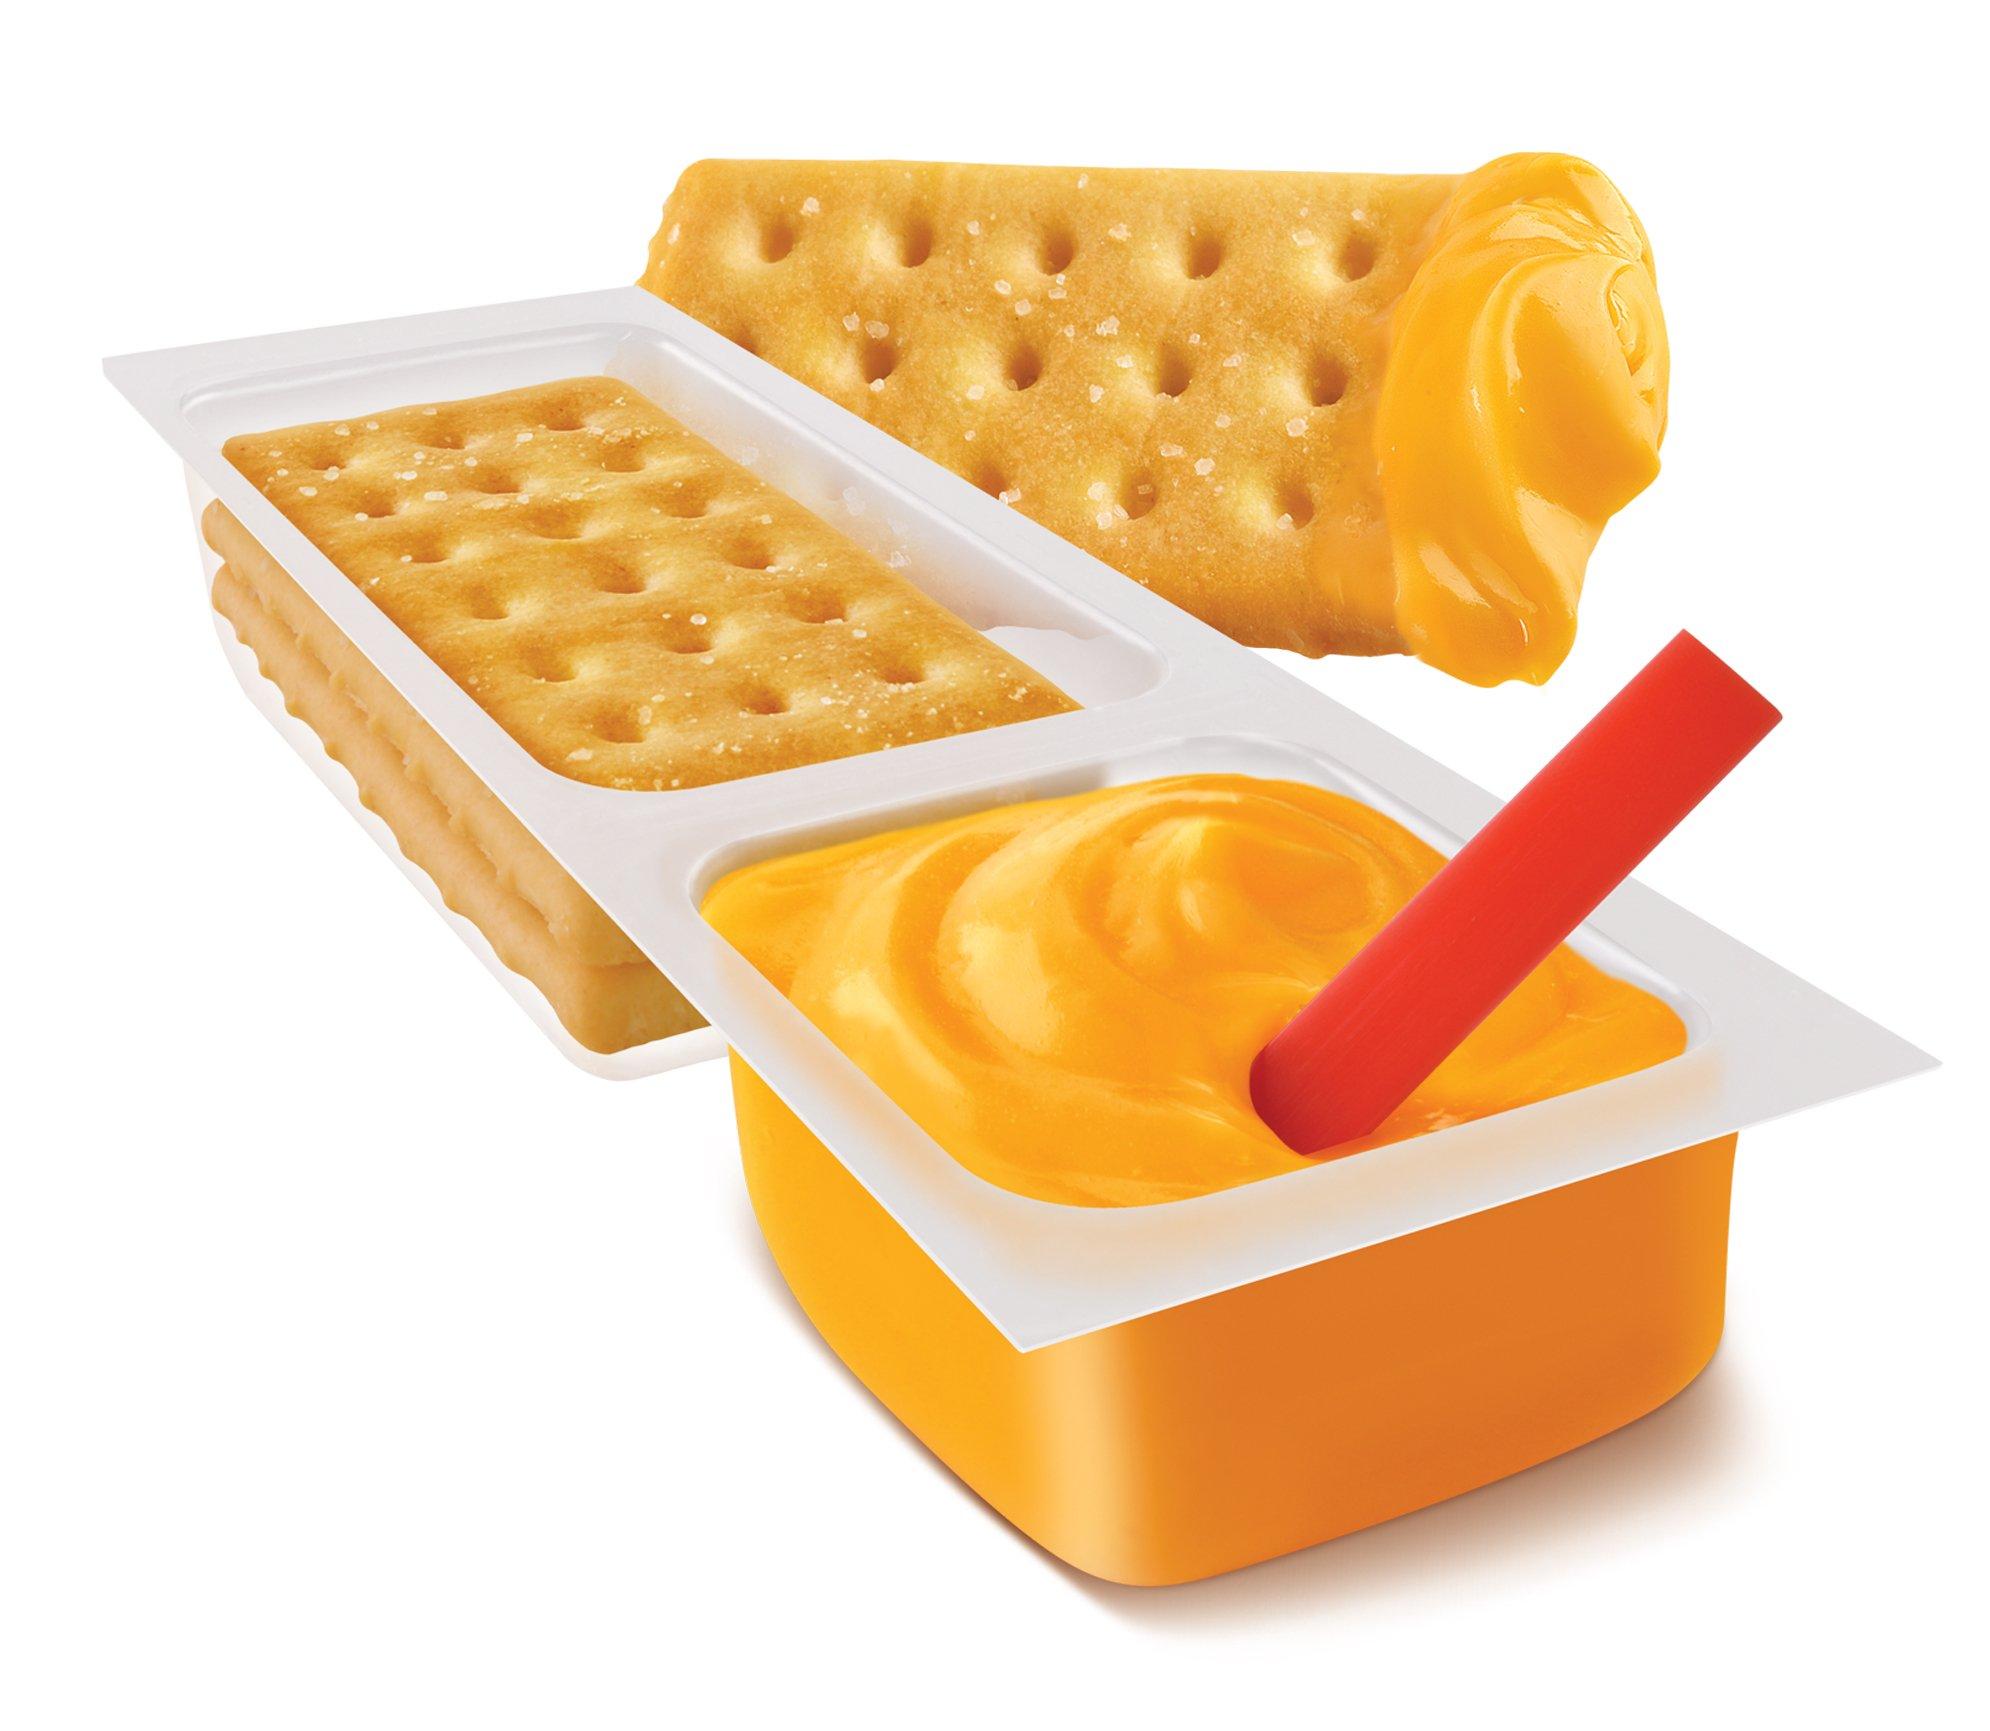 Handi Snacks Ritz Crackers 'n Cheese Dip, 5.7 Ounce (Pack of 12) by Ritz (Image #5)